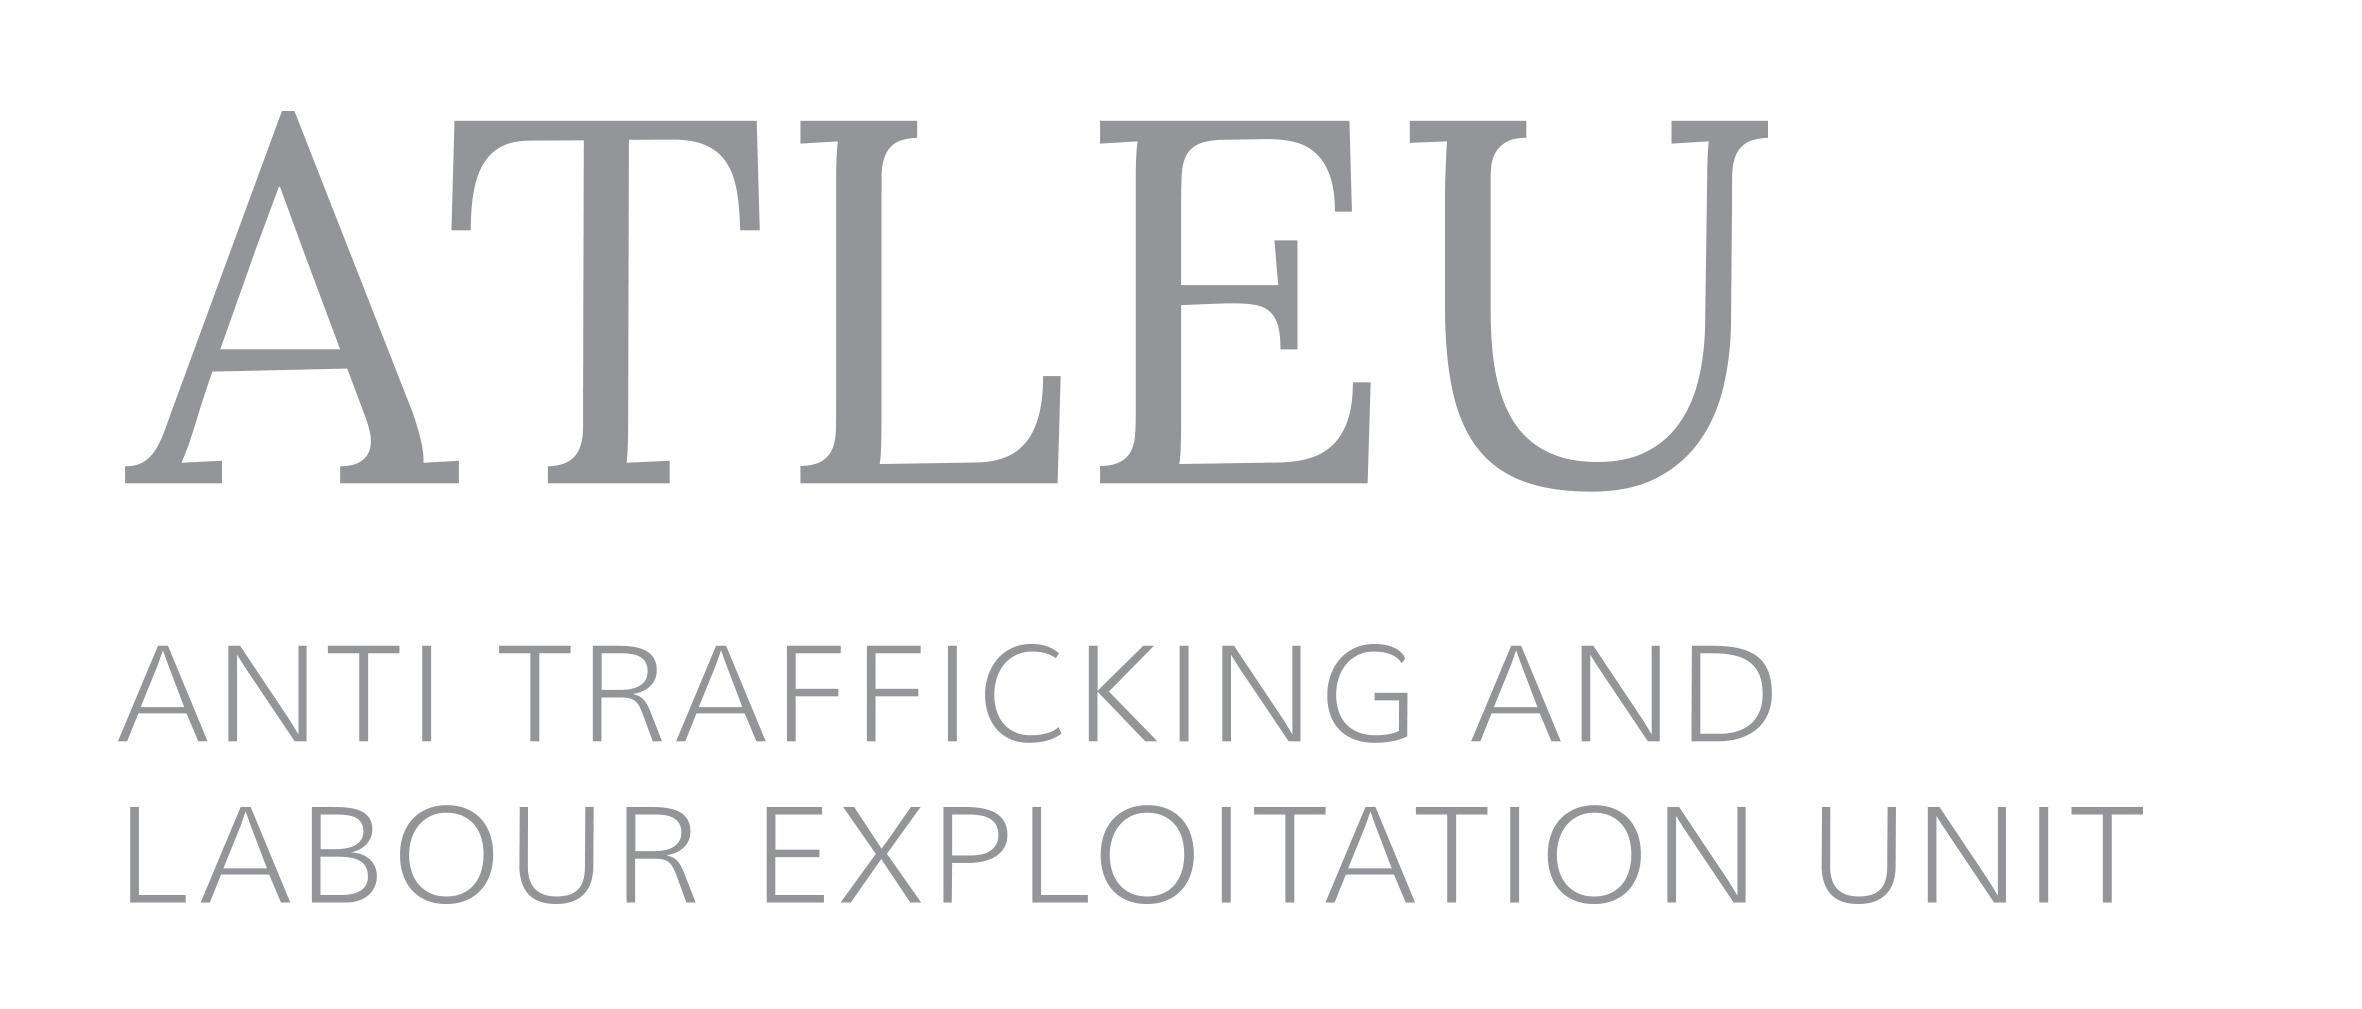 Anti Trafficking and Labour Exploitation Unit (ATLEU)